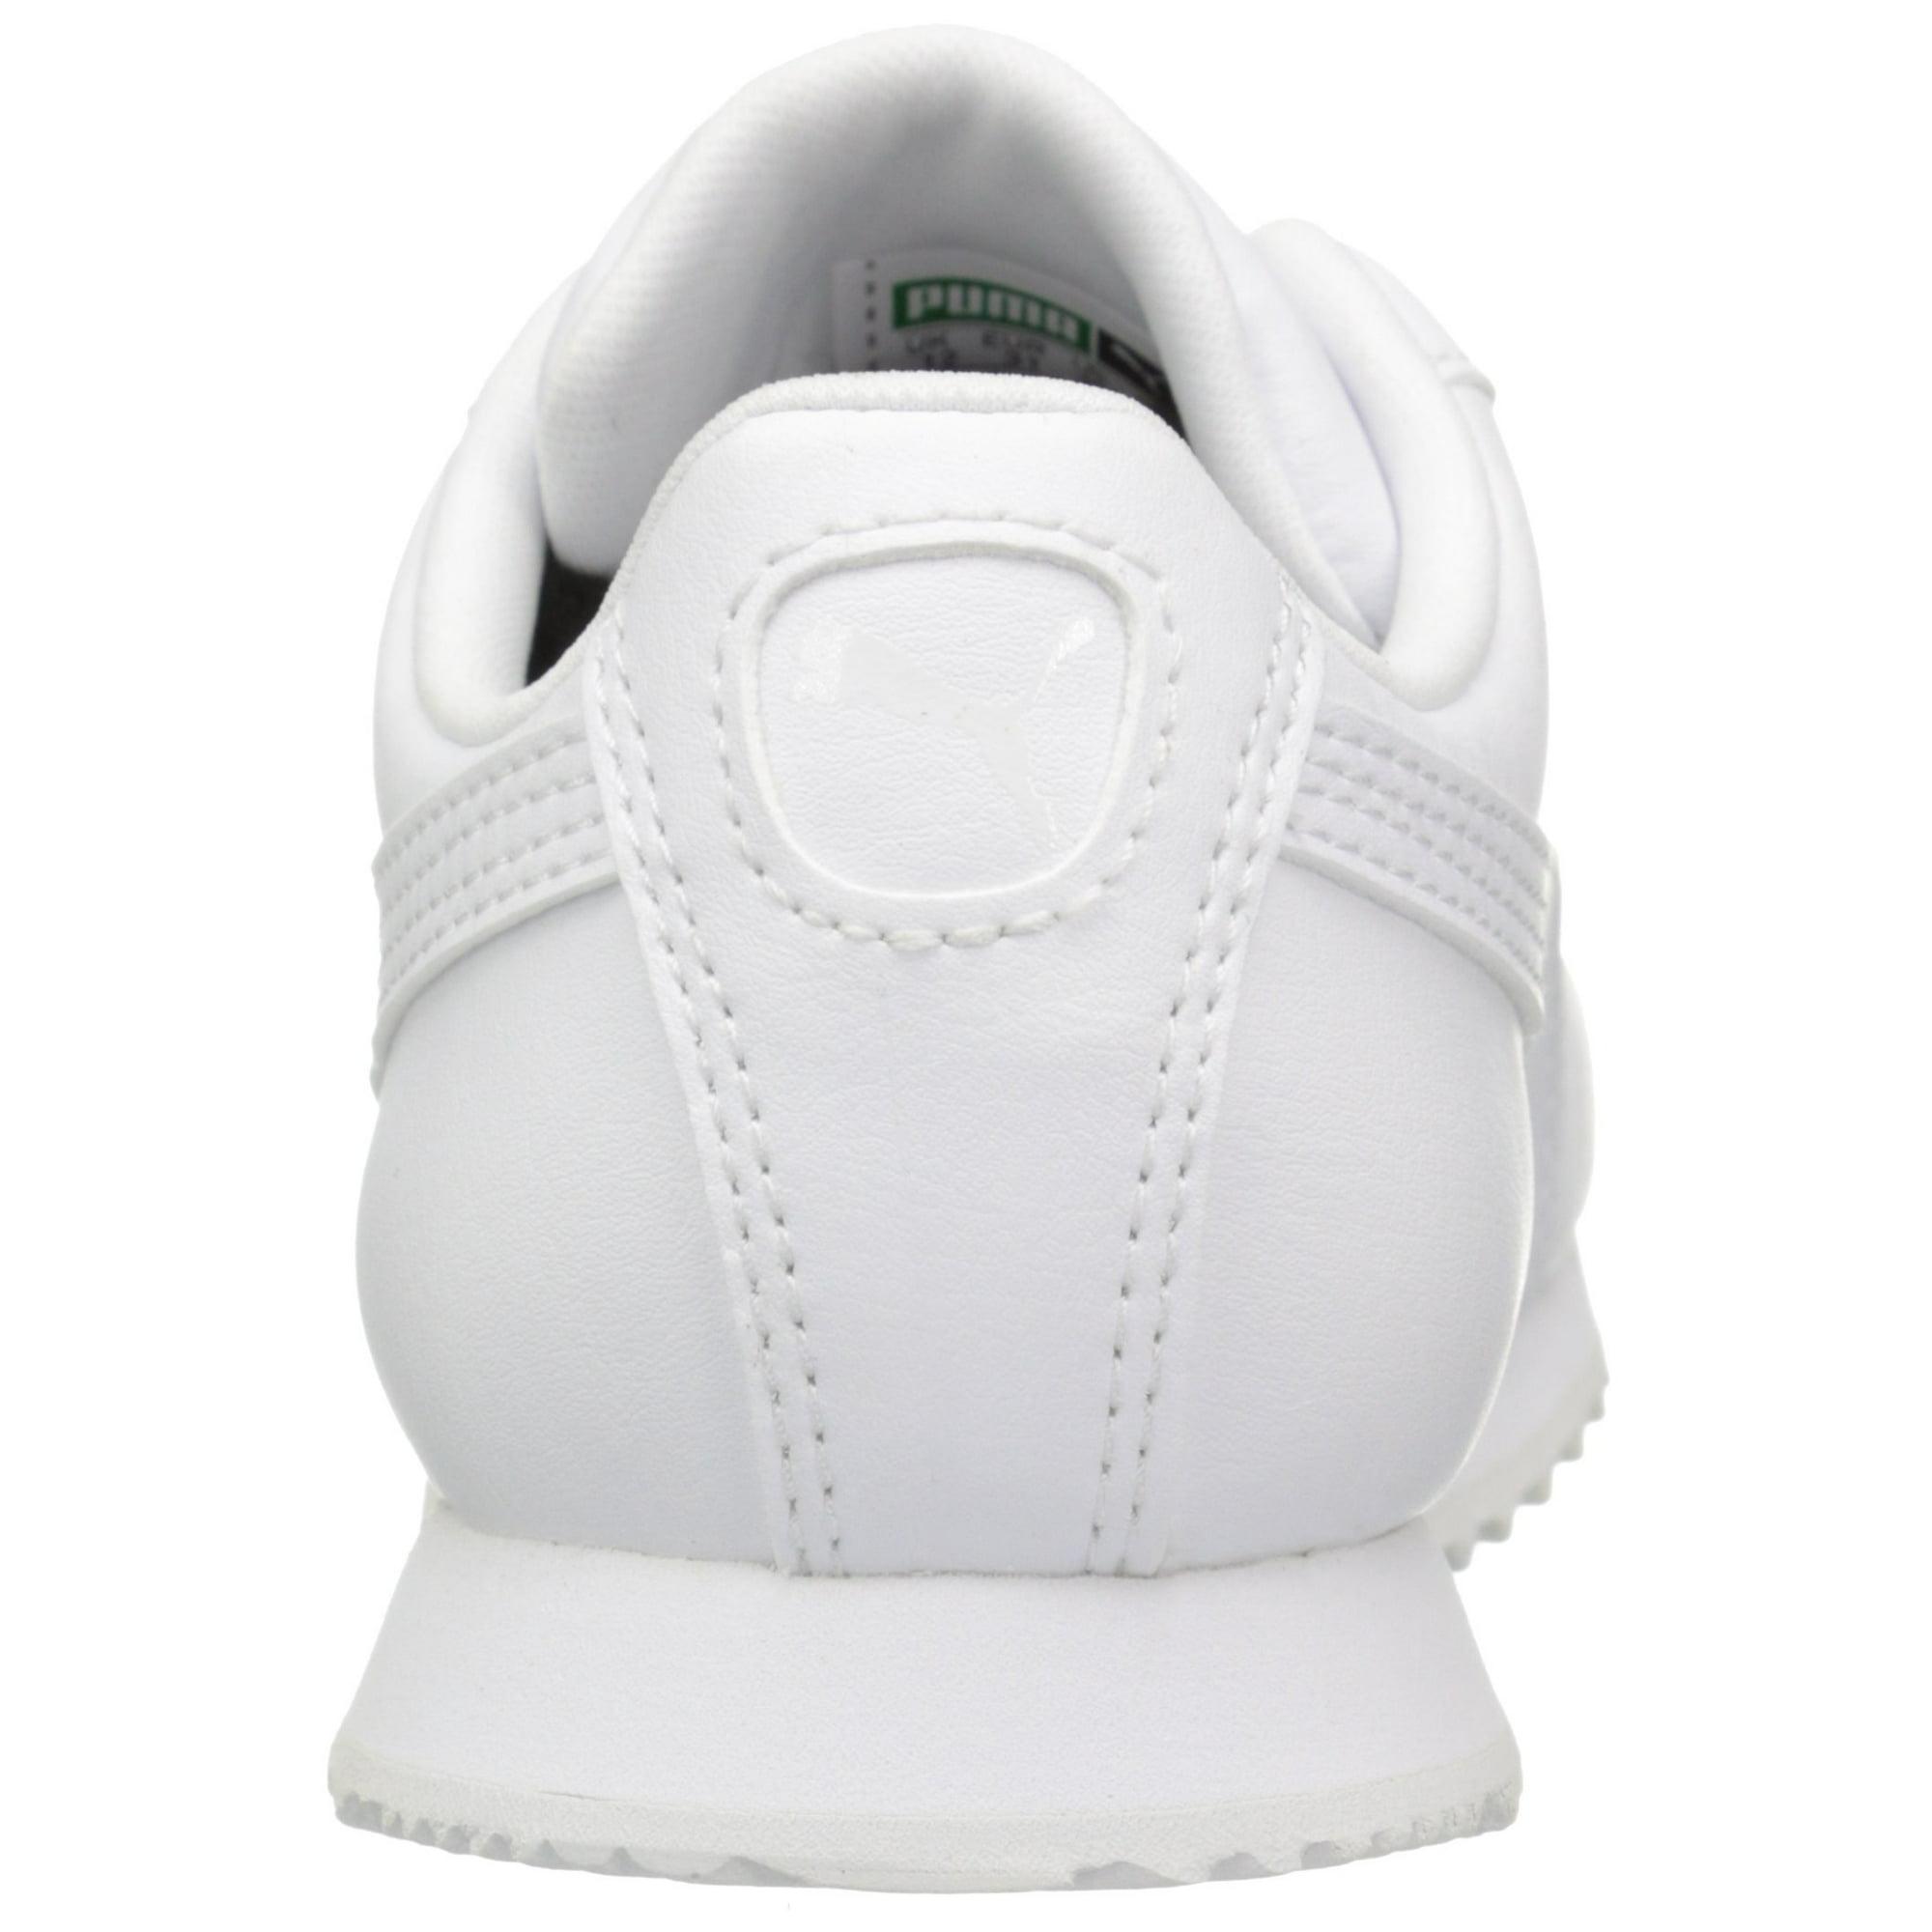 e8e0633cf92 Buy Puma 361594-14: Boys' Roma Basic PS-K Kid White Sneaker ...